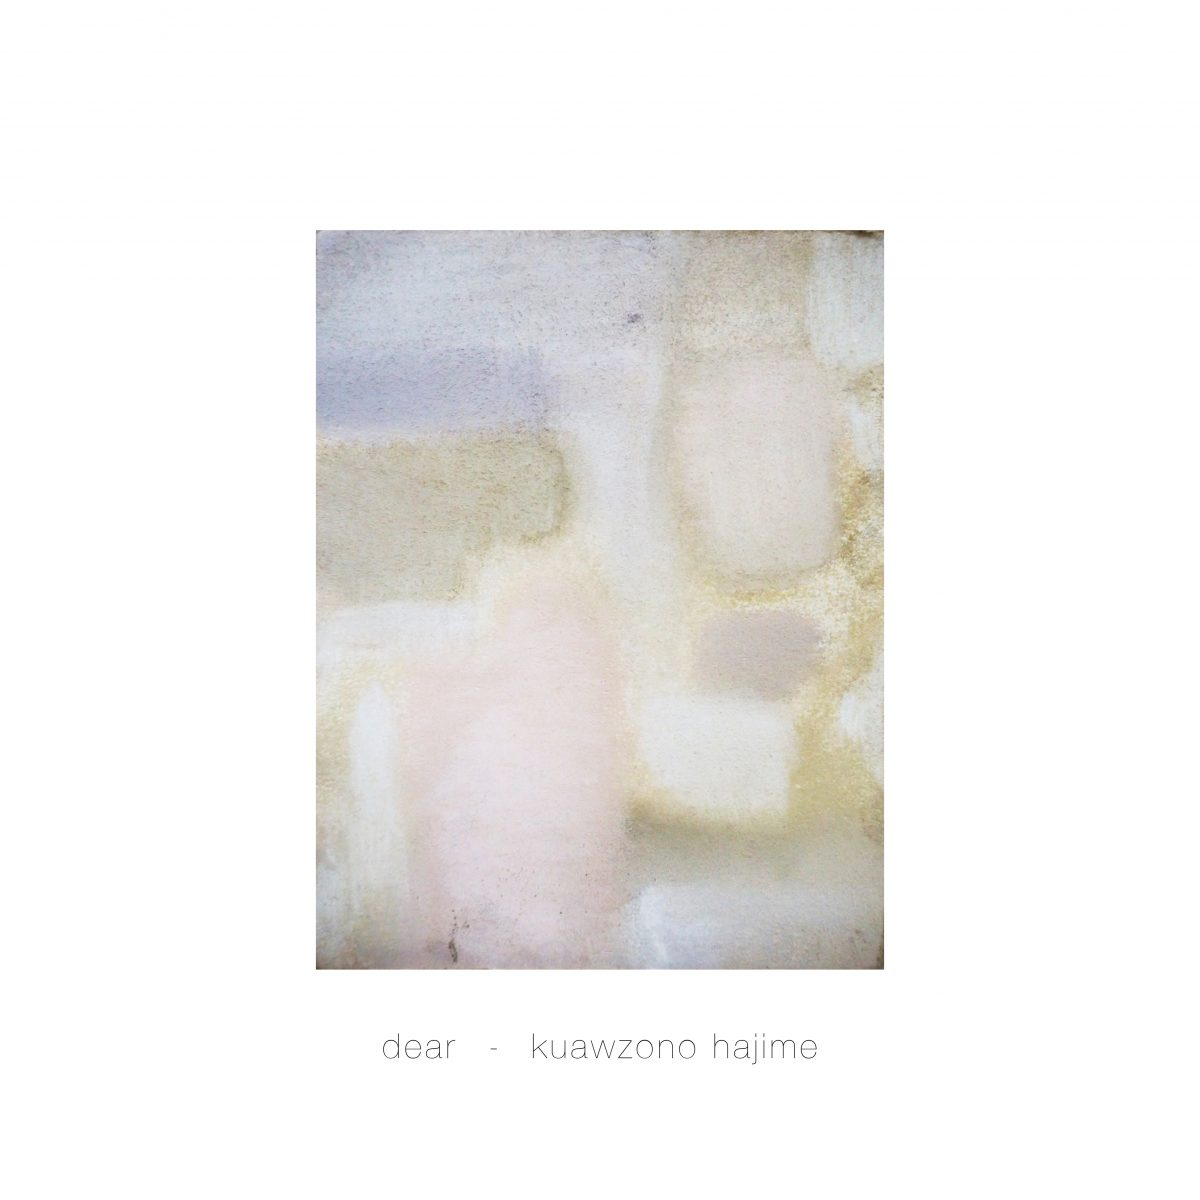 [JP🇯🇵]kuwazono hajime – 'dear'(EP/Produced by lee (asano+ryuhei))